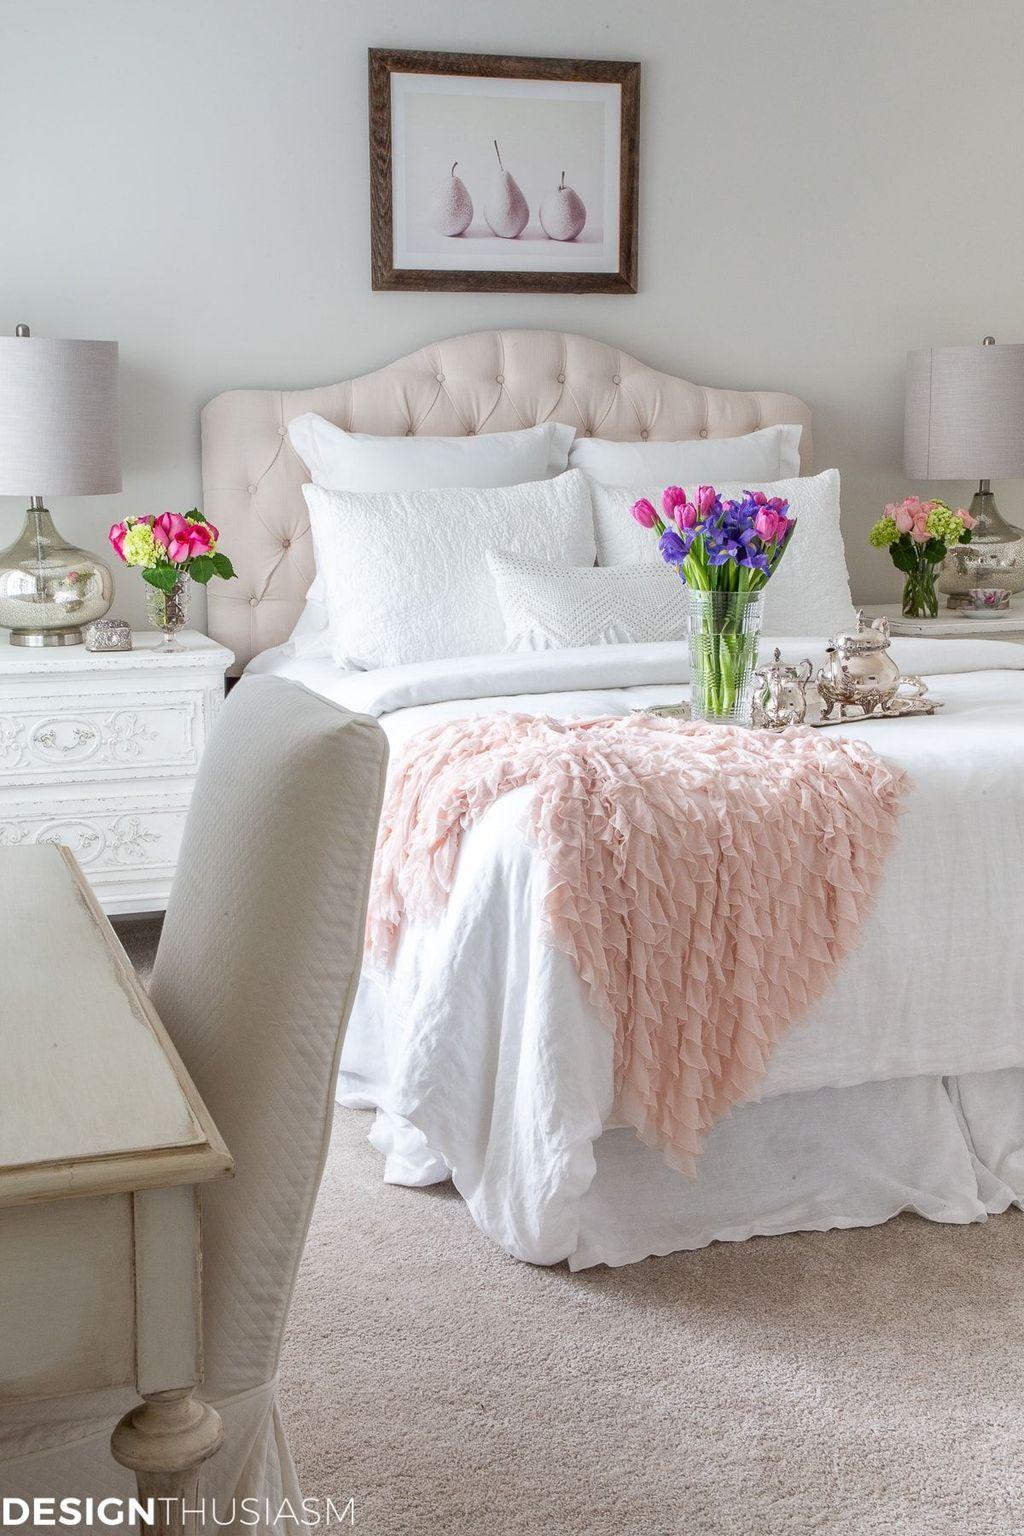 Lovely Spring Bedroom Decor Ideas Trending This Year 33